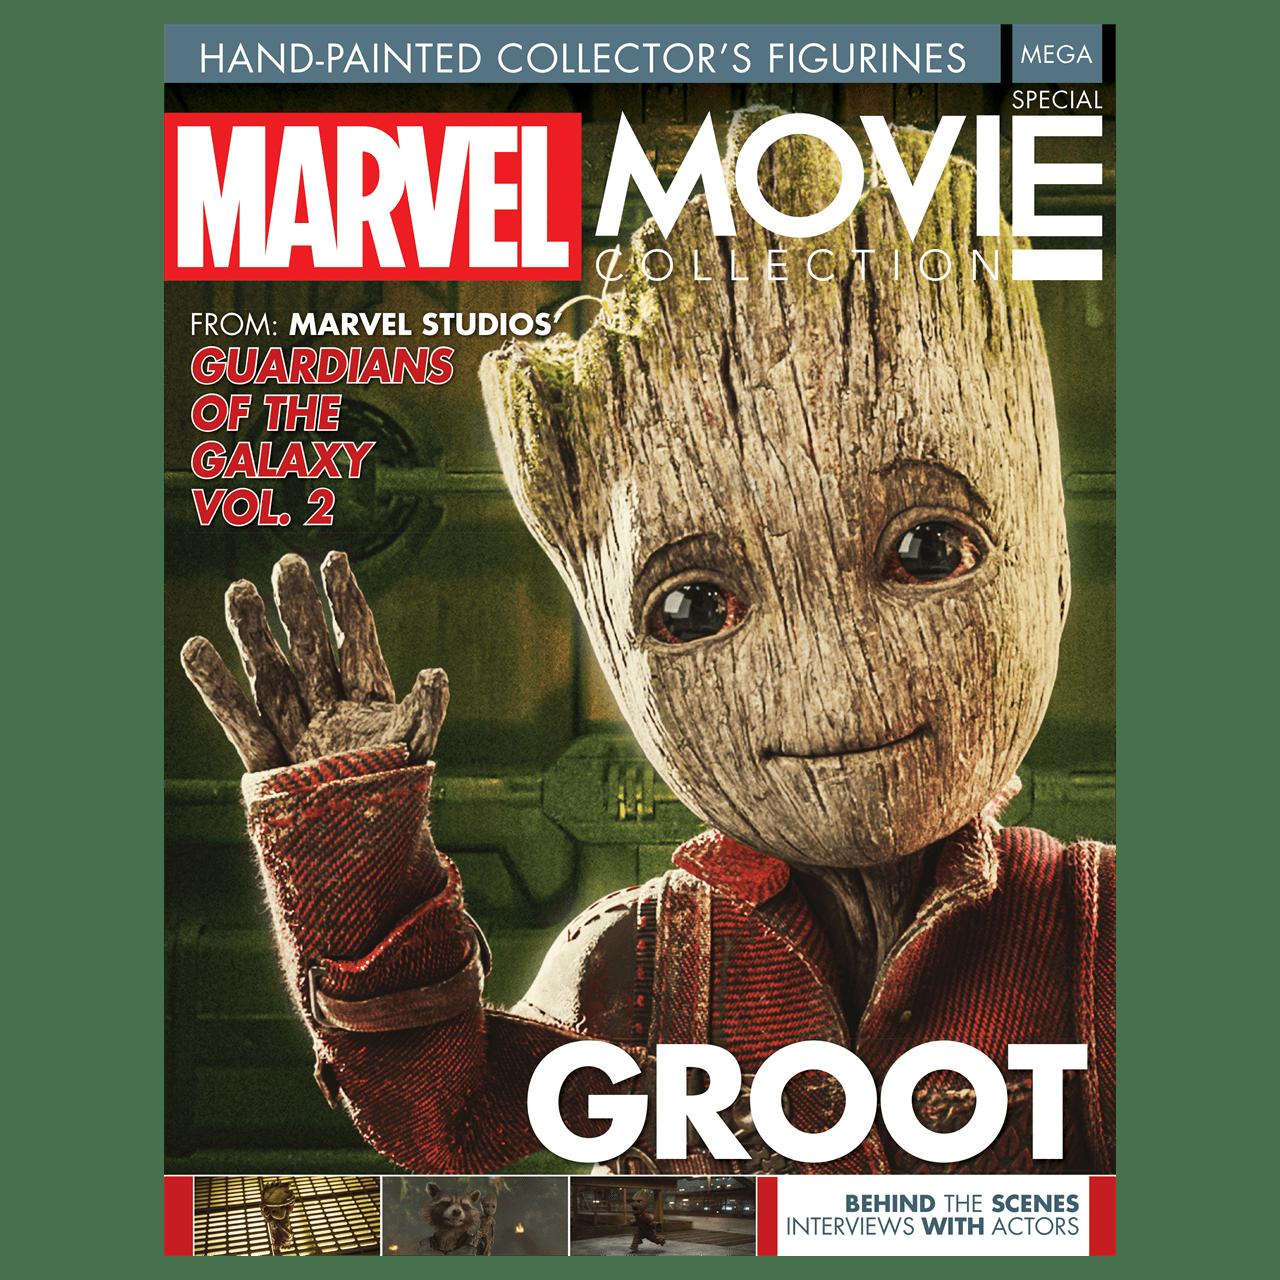 Baby Groot: Marvel Mega Figurine (online only) Hero Collector - 6